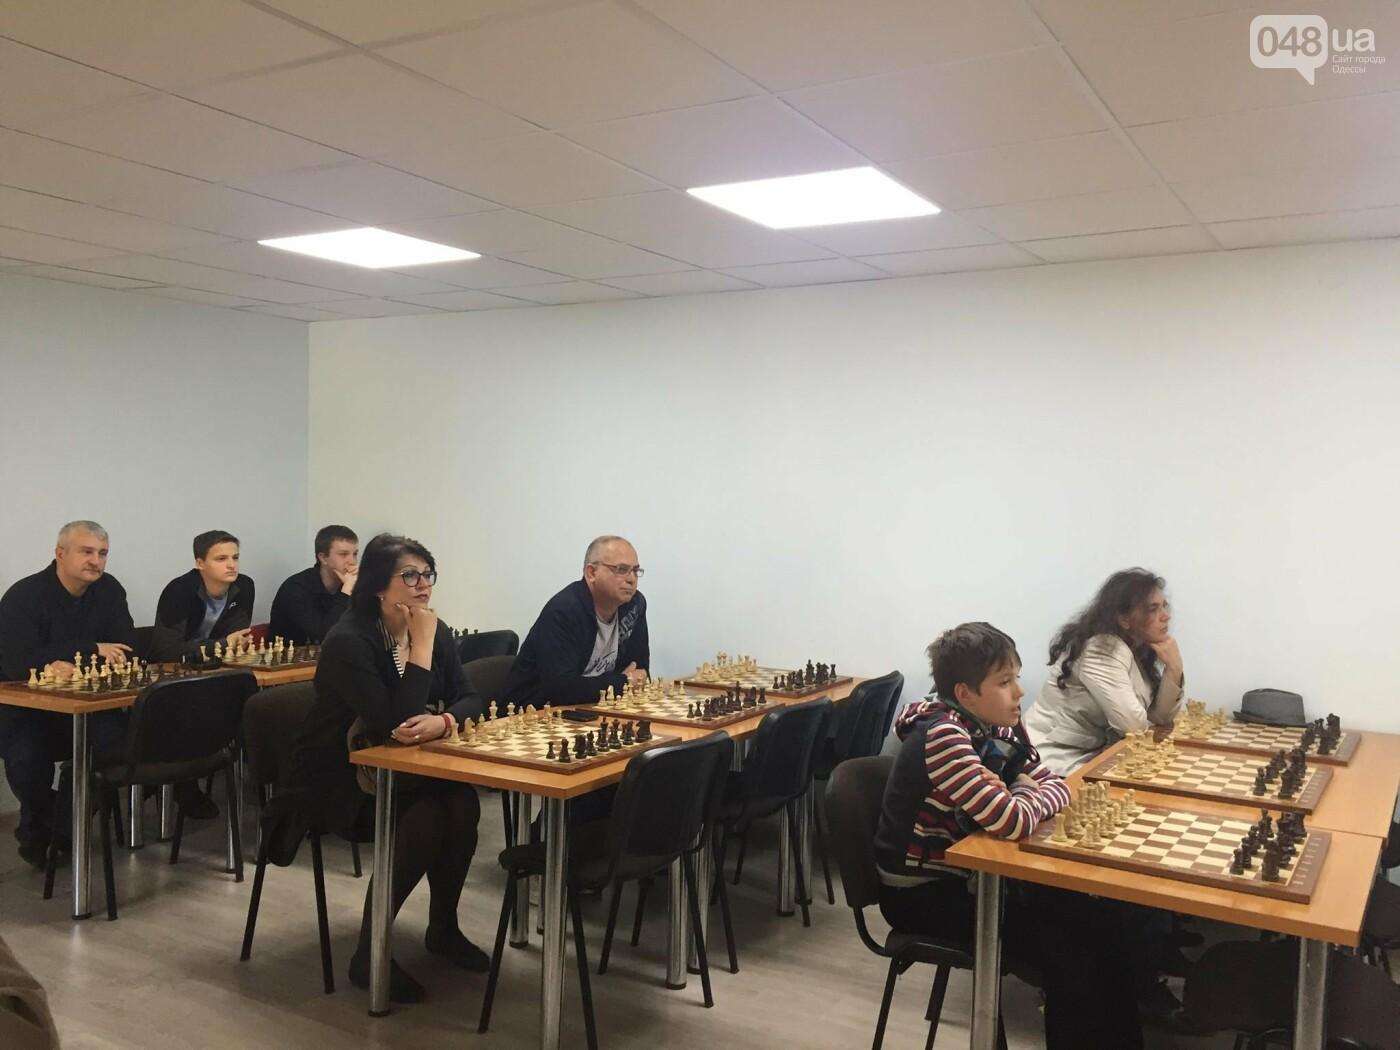 Одесситам рассказали о шахматном наследии Остапа Бендера,  - ФОТО, ВИДЕО, фото-4, Фото: 048